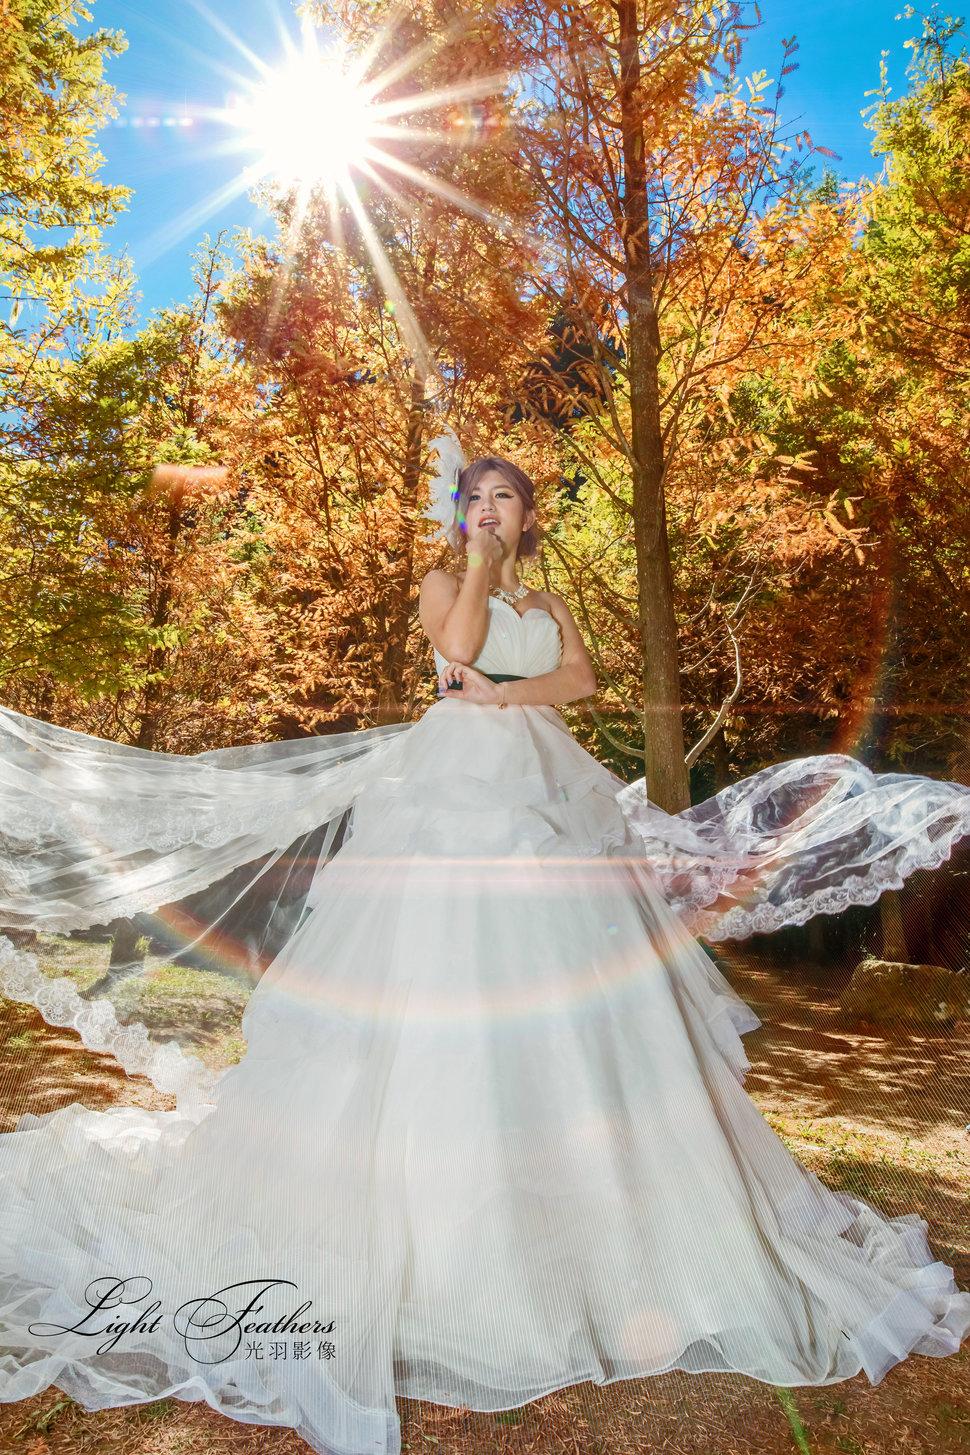 5D4_2924-2 - Promaker婚禮紀錄攝影團隊婚攝豪哥《結婚吧》